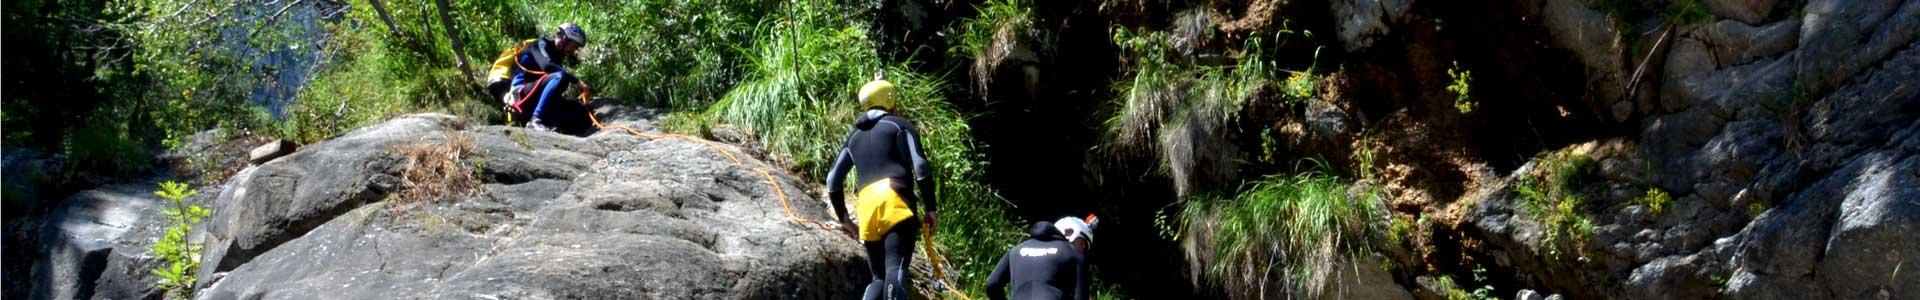 canyoning avventura